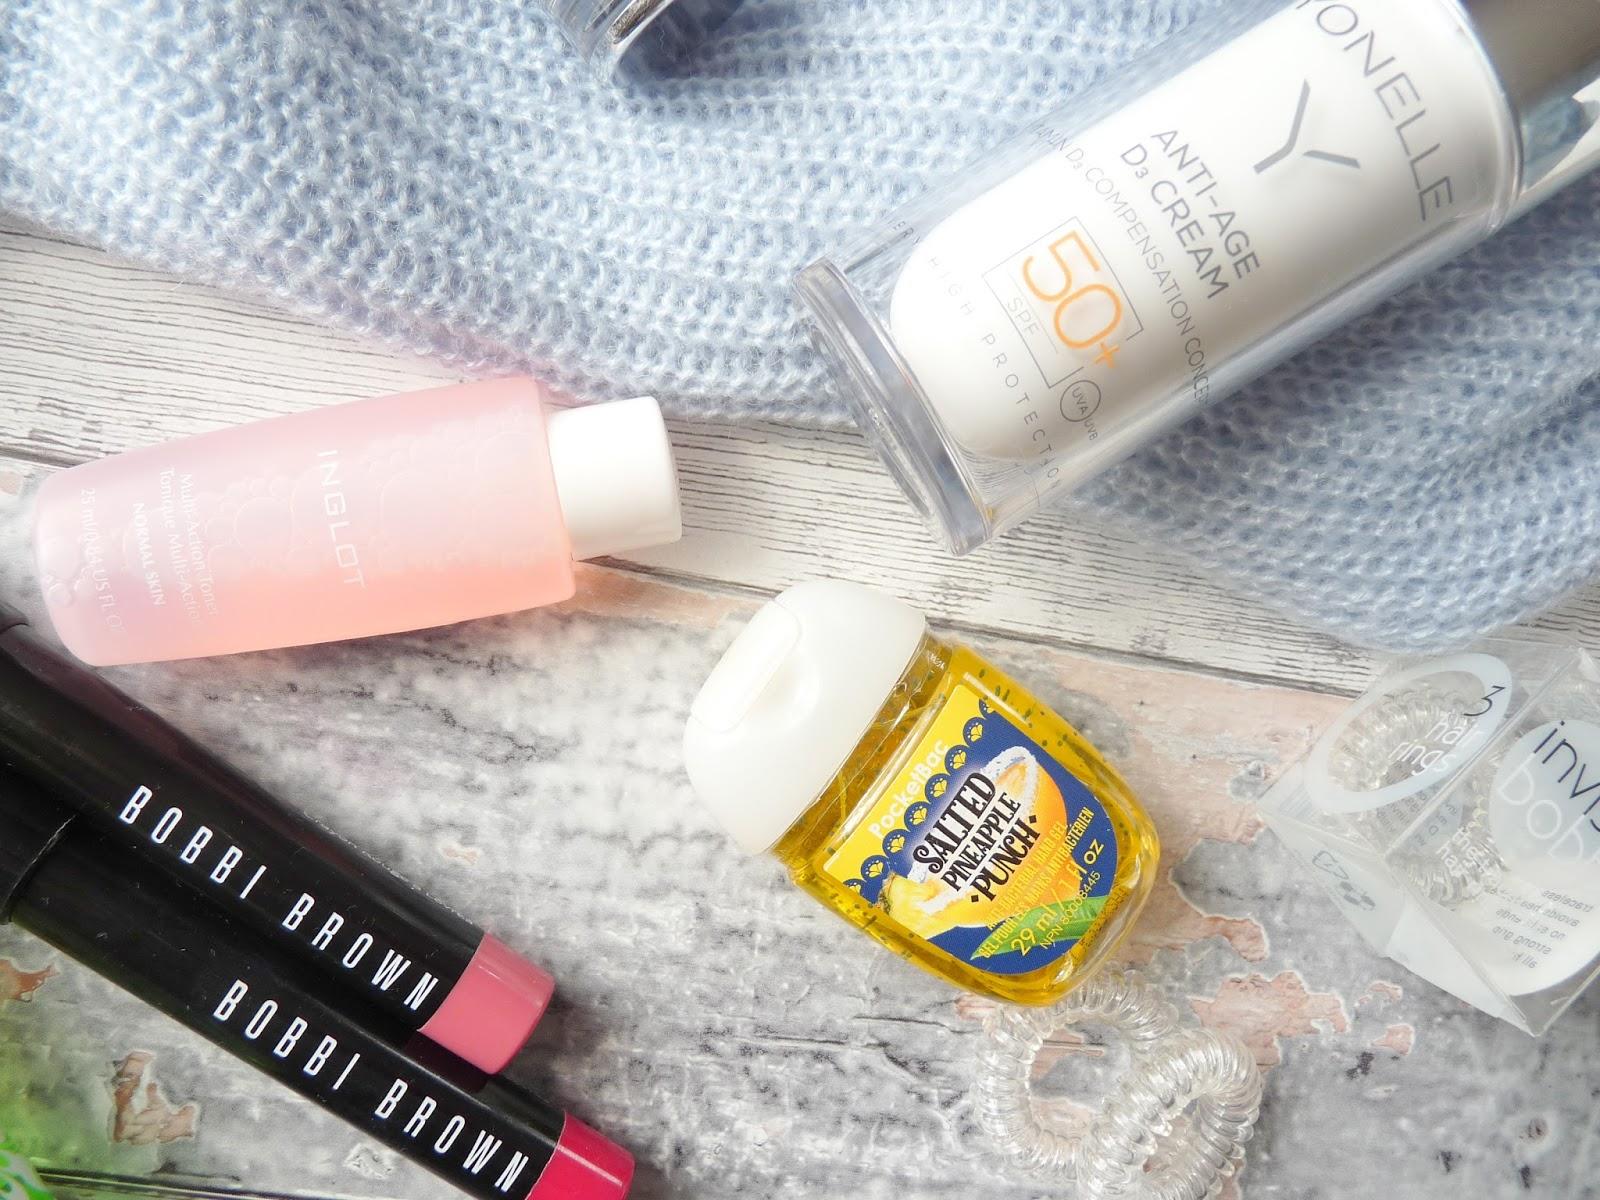 Bobbi Brown makijaż ust kredki szminki matowe